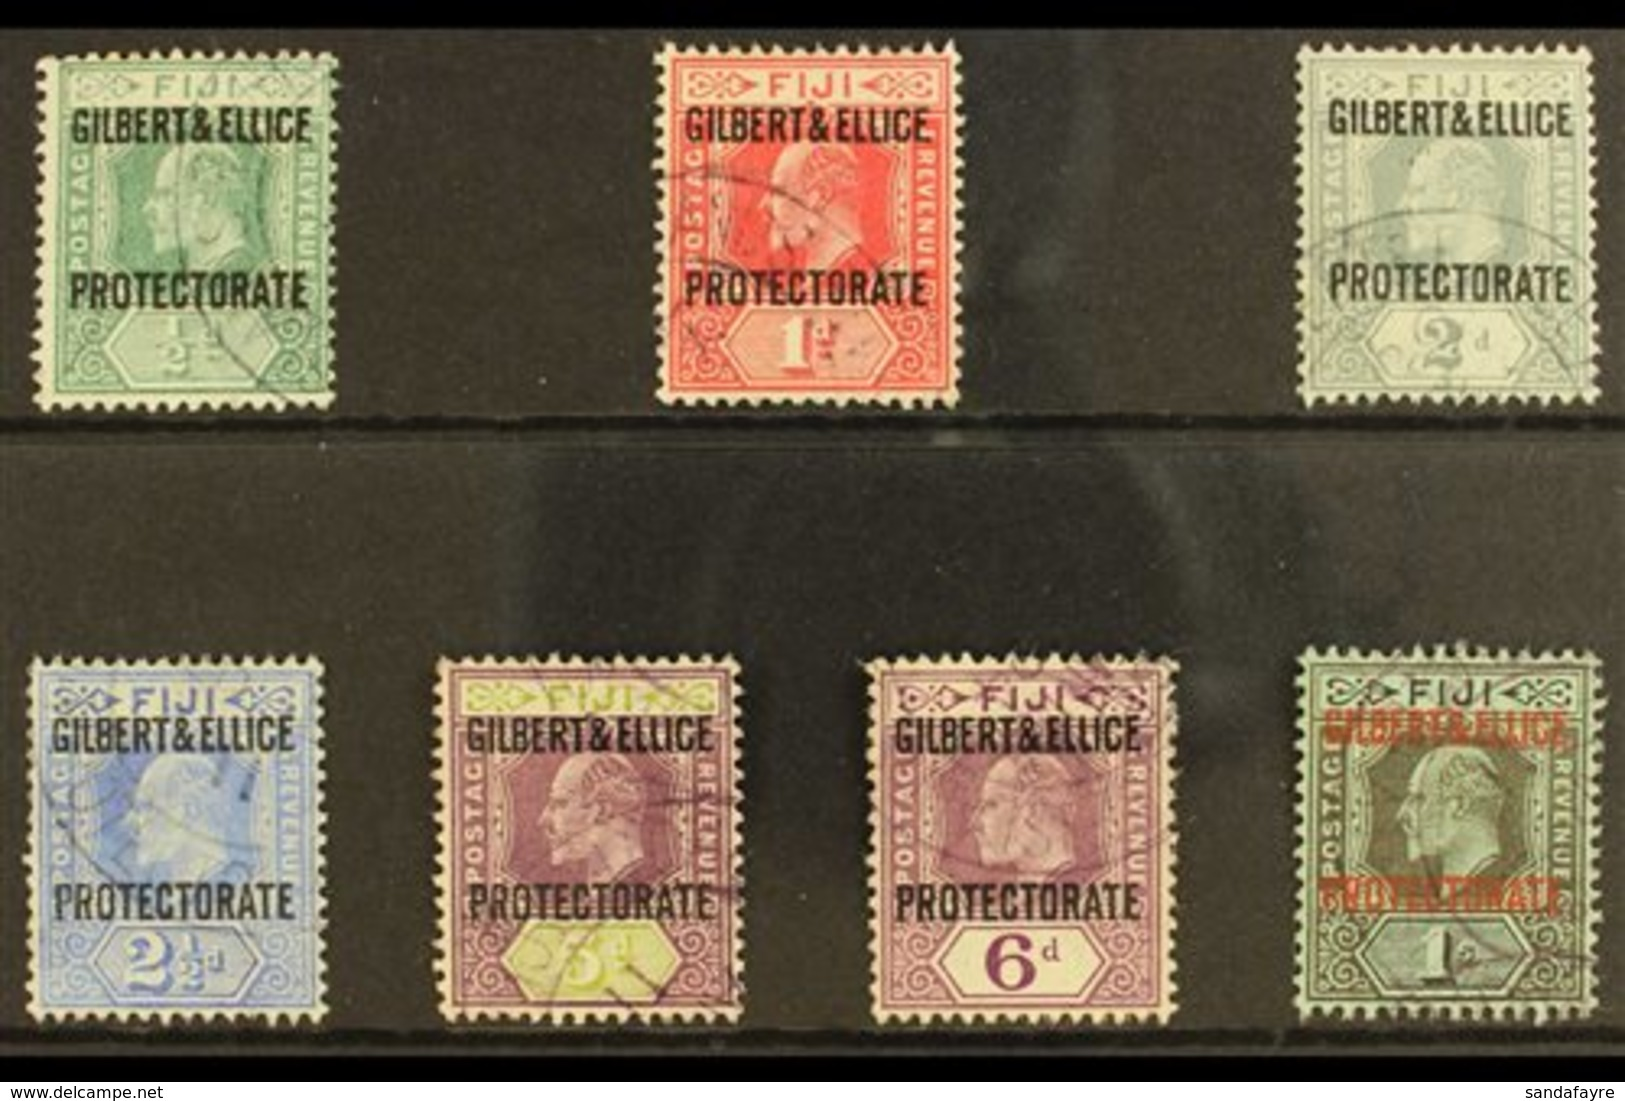 1911 Protectorate Overprint Set, SG 1/7, Very Fine Used (7 Stamps) For More Images, Please Visit Http://www.sandafayre.c - Gilbert- En Ellice-eilanden (...-1979)